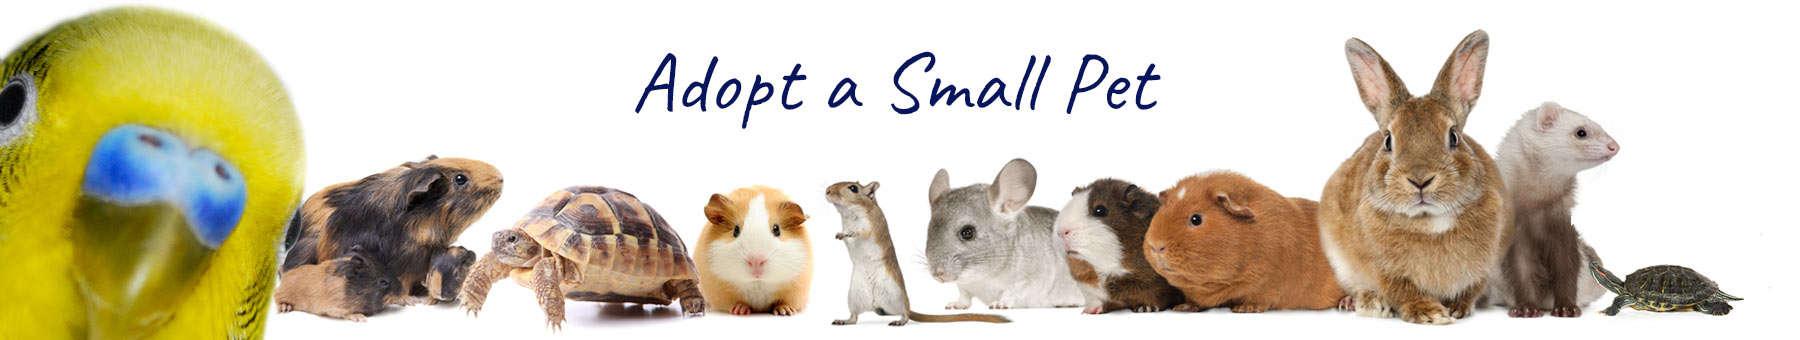 adopt a small pet